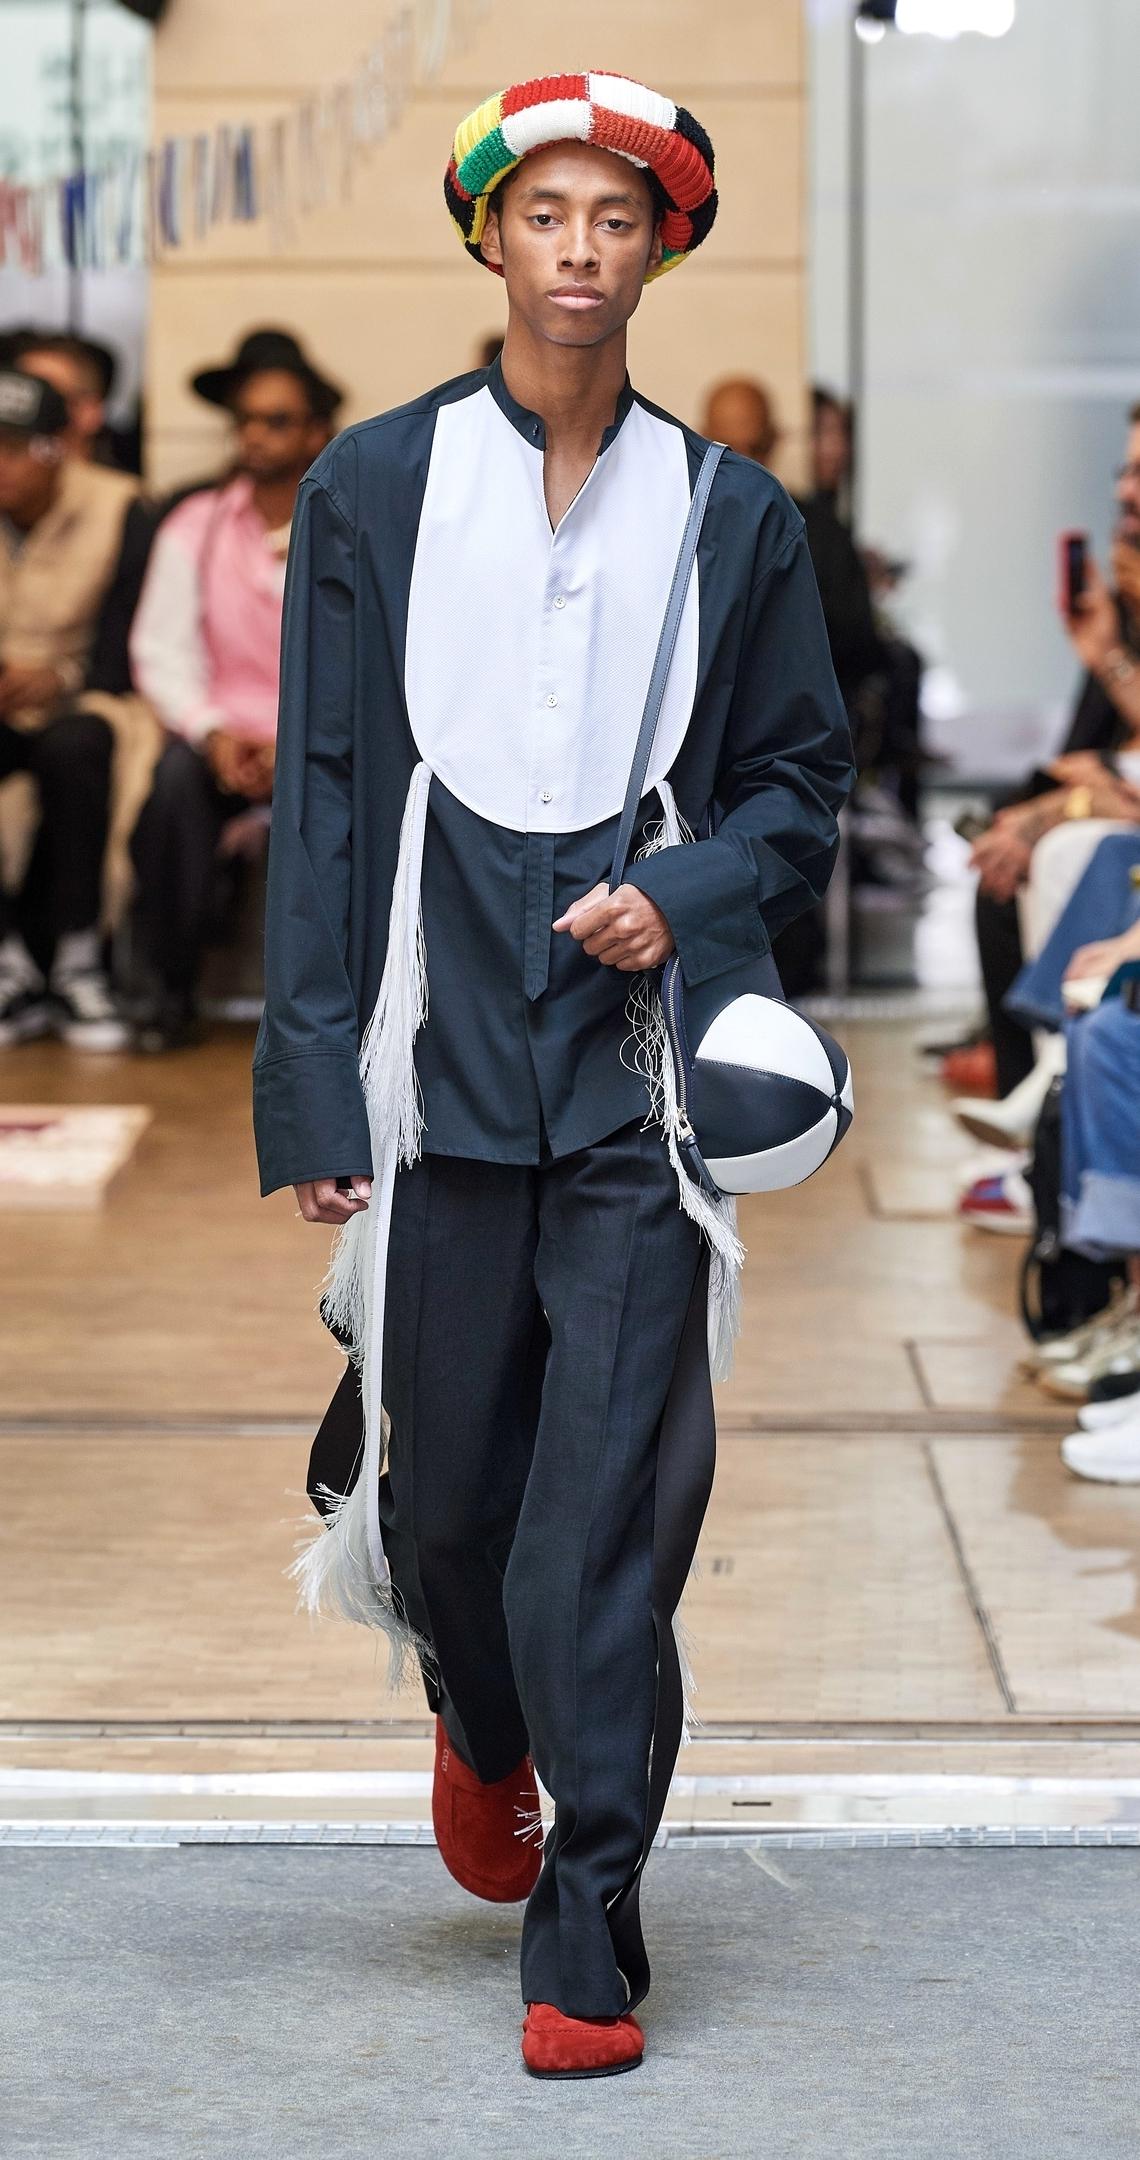 Образ из коллекции JW Anderson Spring/Summer 2020 Menswear